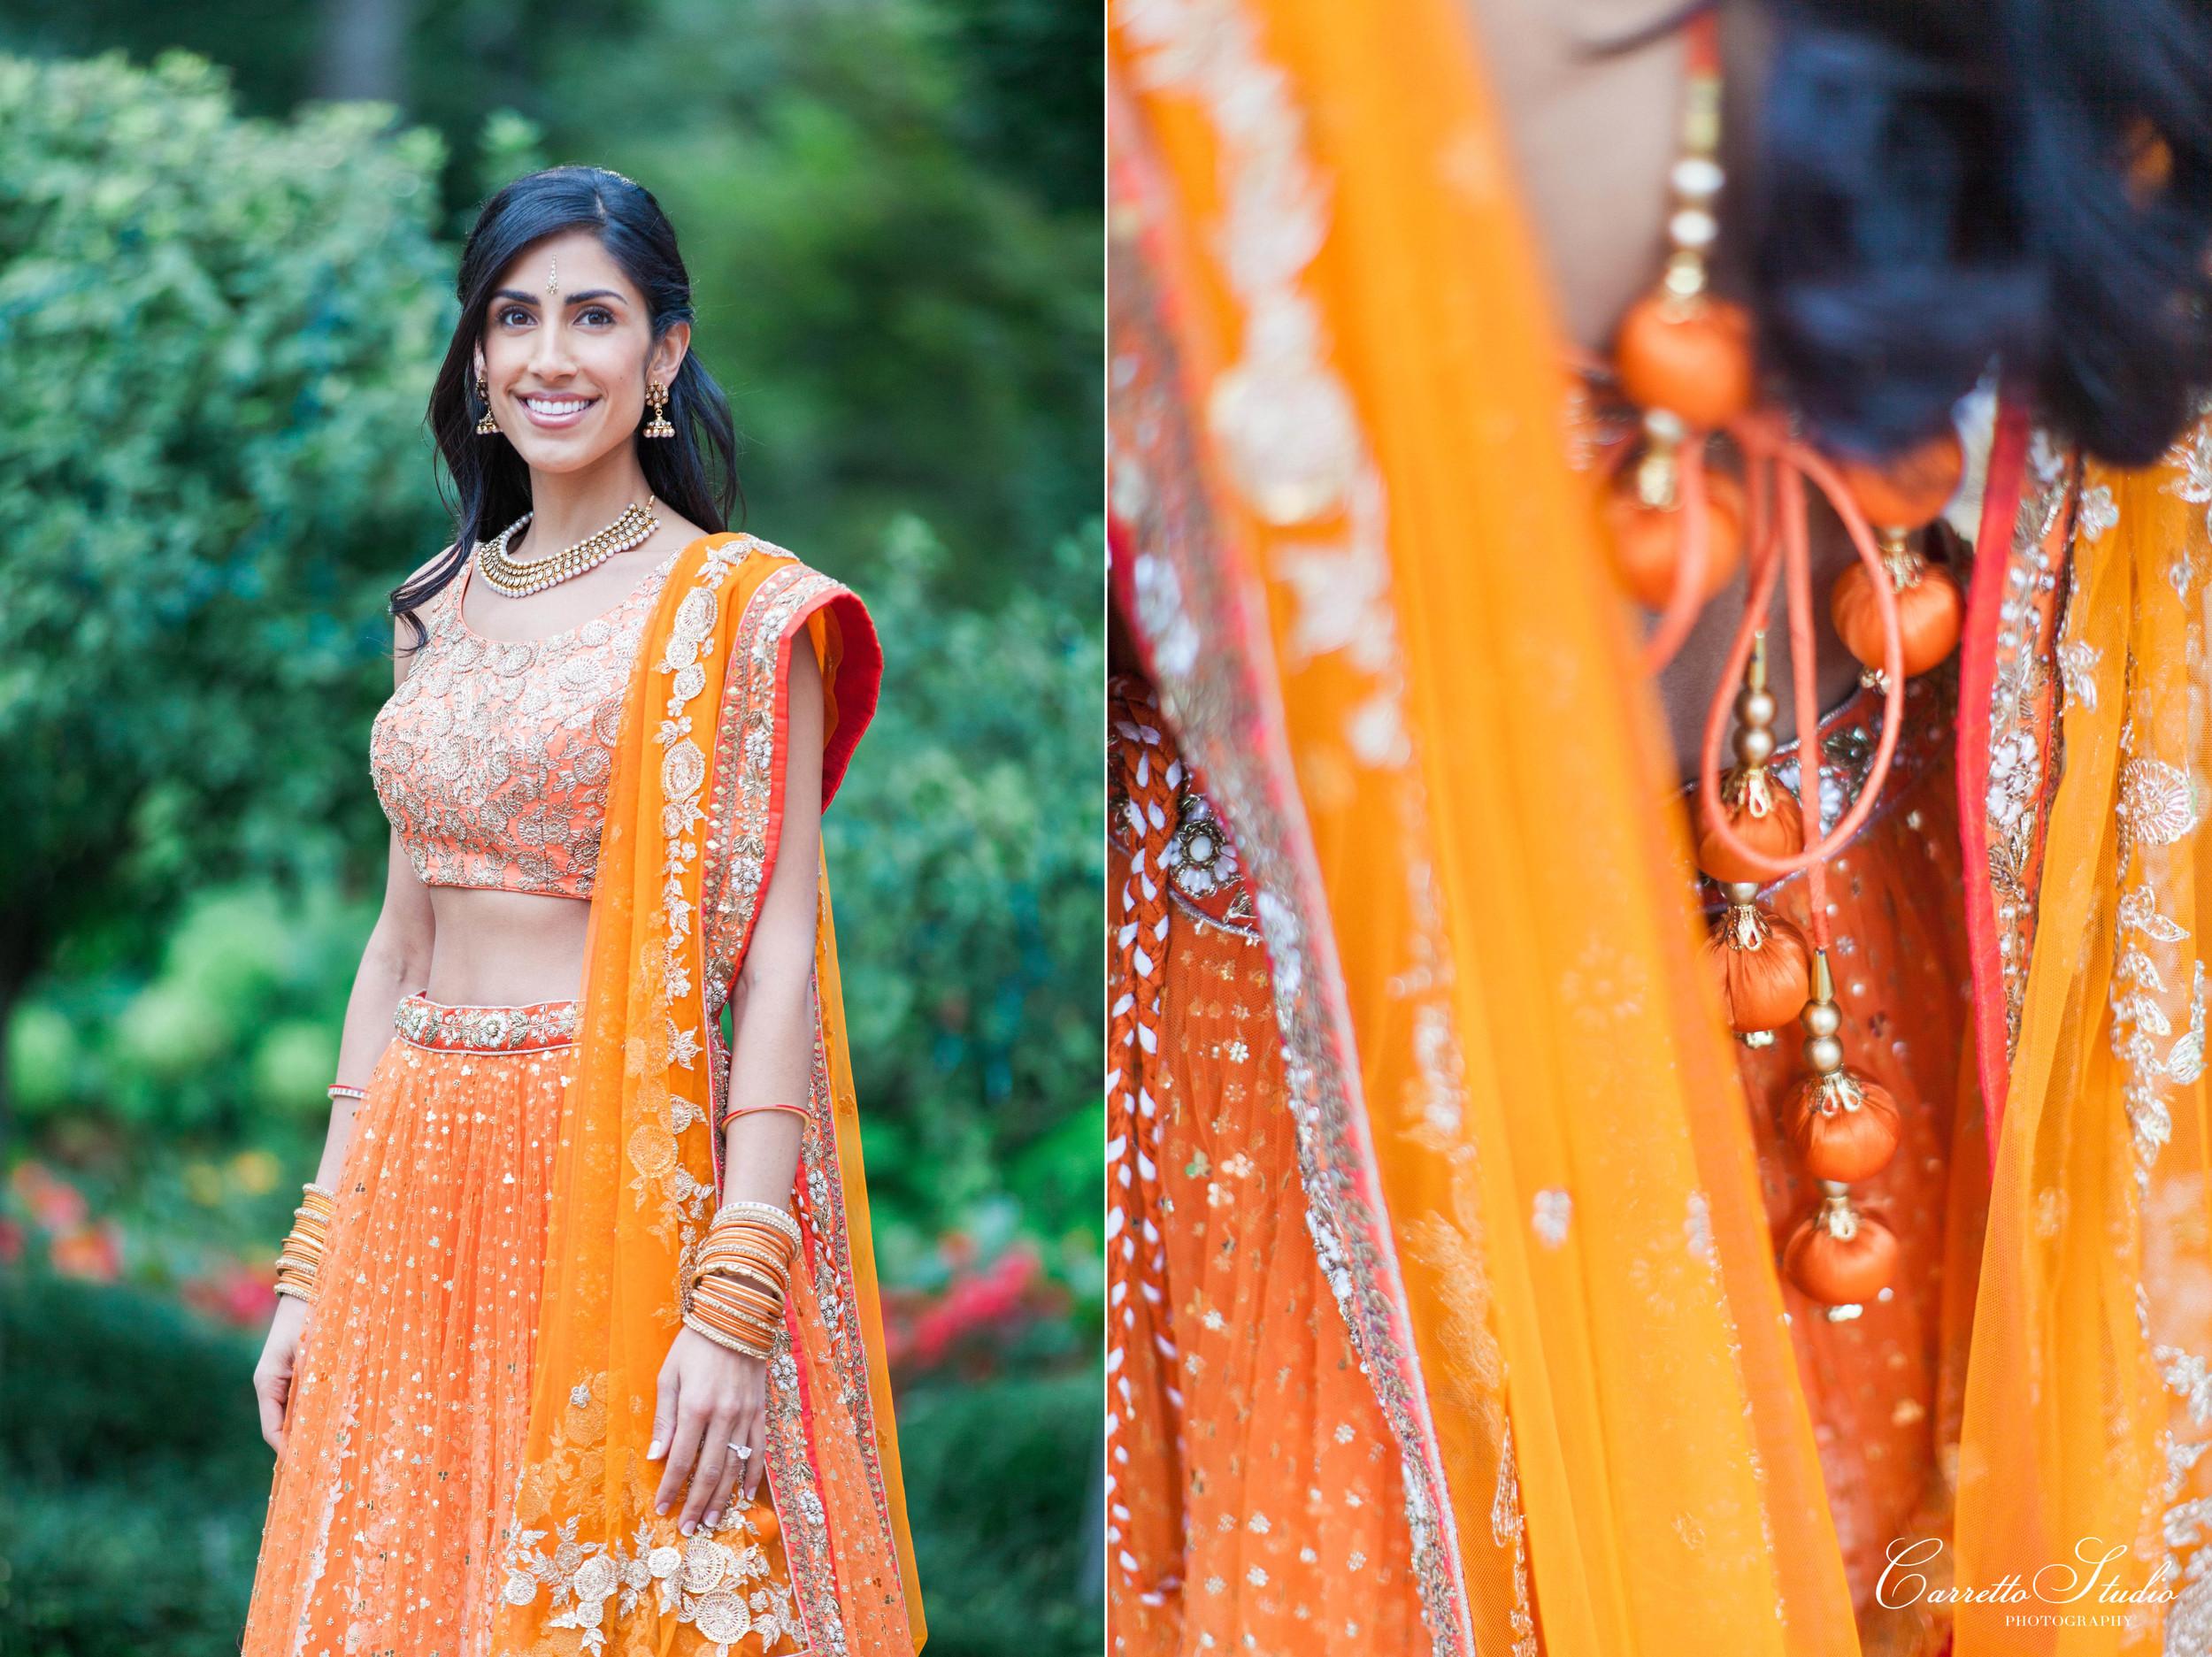 St Louis Wedding Photography-1026 copy.jpg